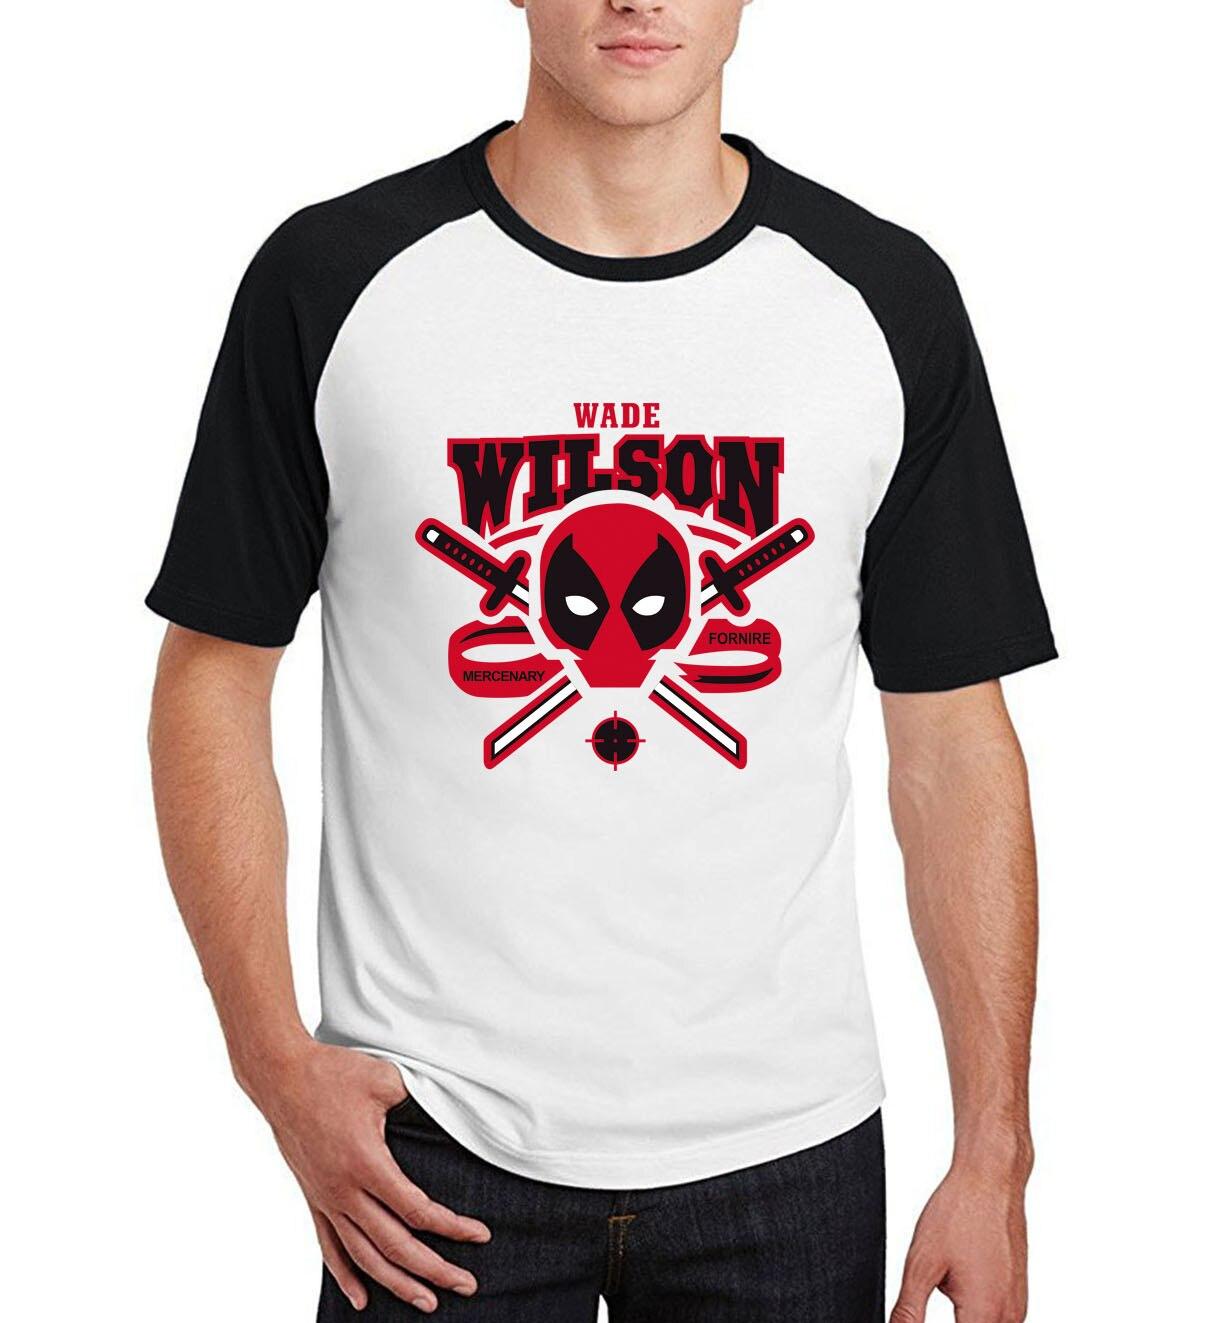 2019 summer  fitness hip-hop t-shirts men's marvel deadpool harajuku t shirts funny raglan short sleeve tops camisetas